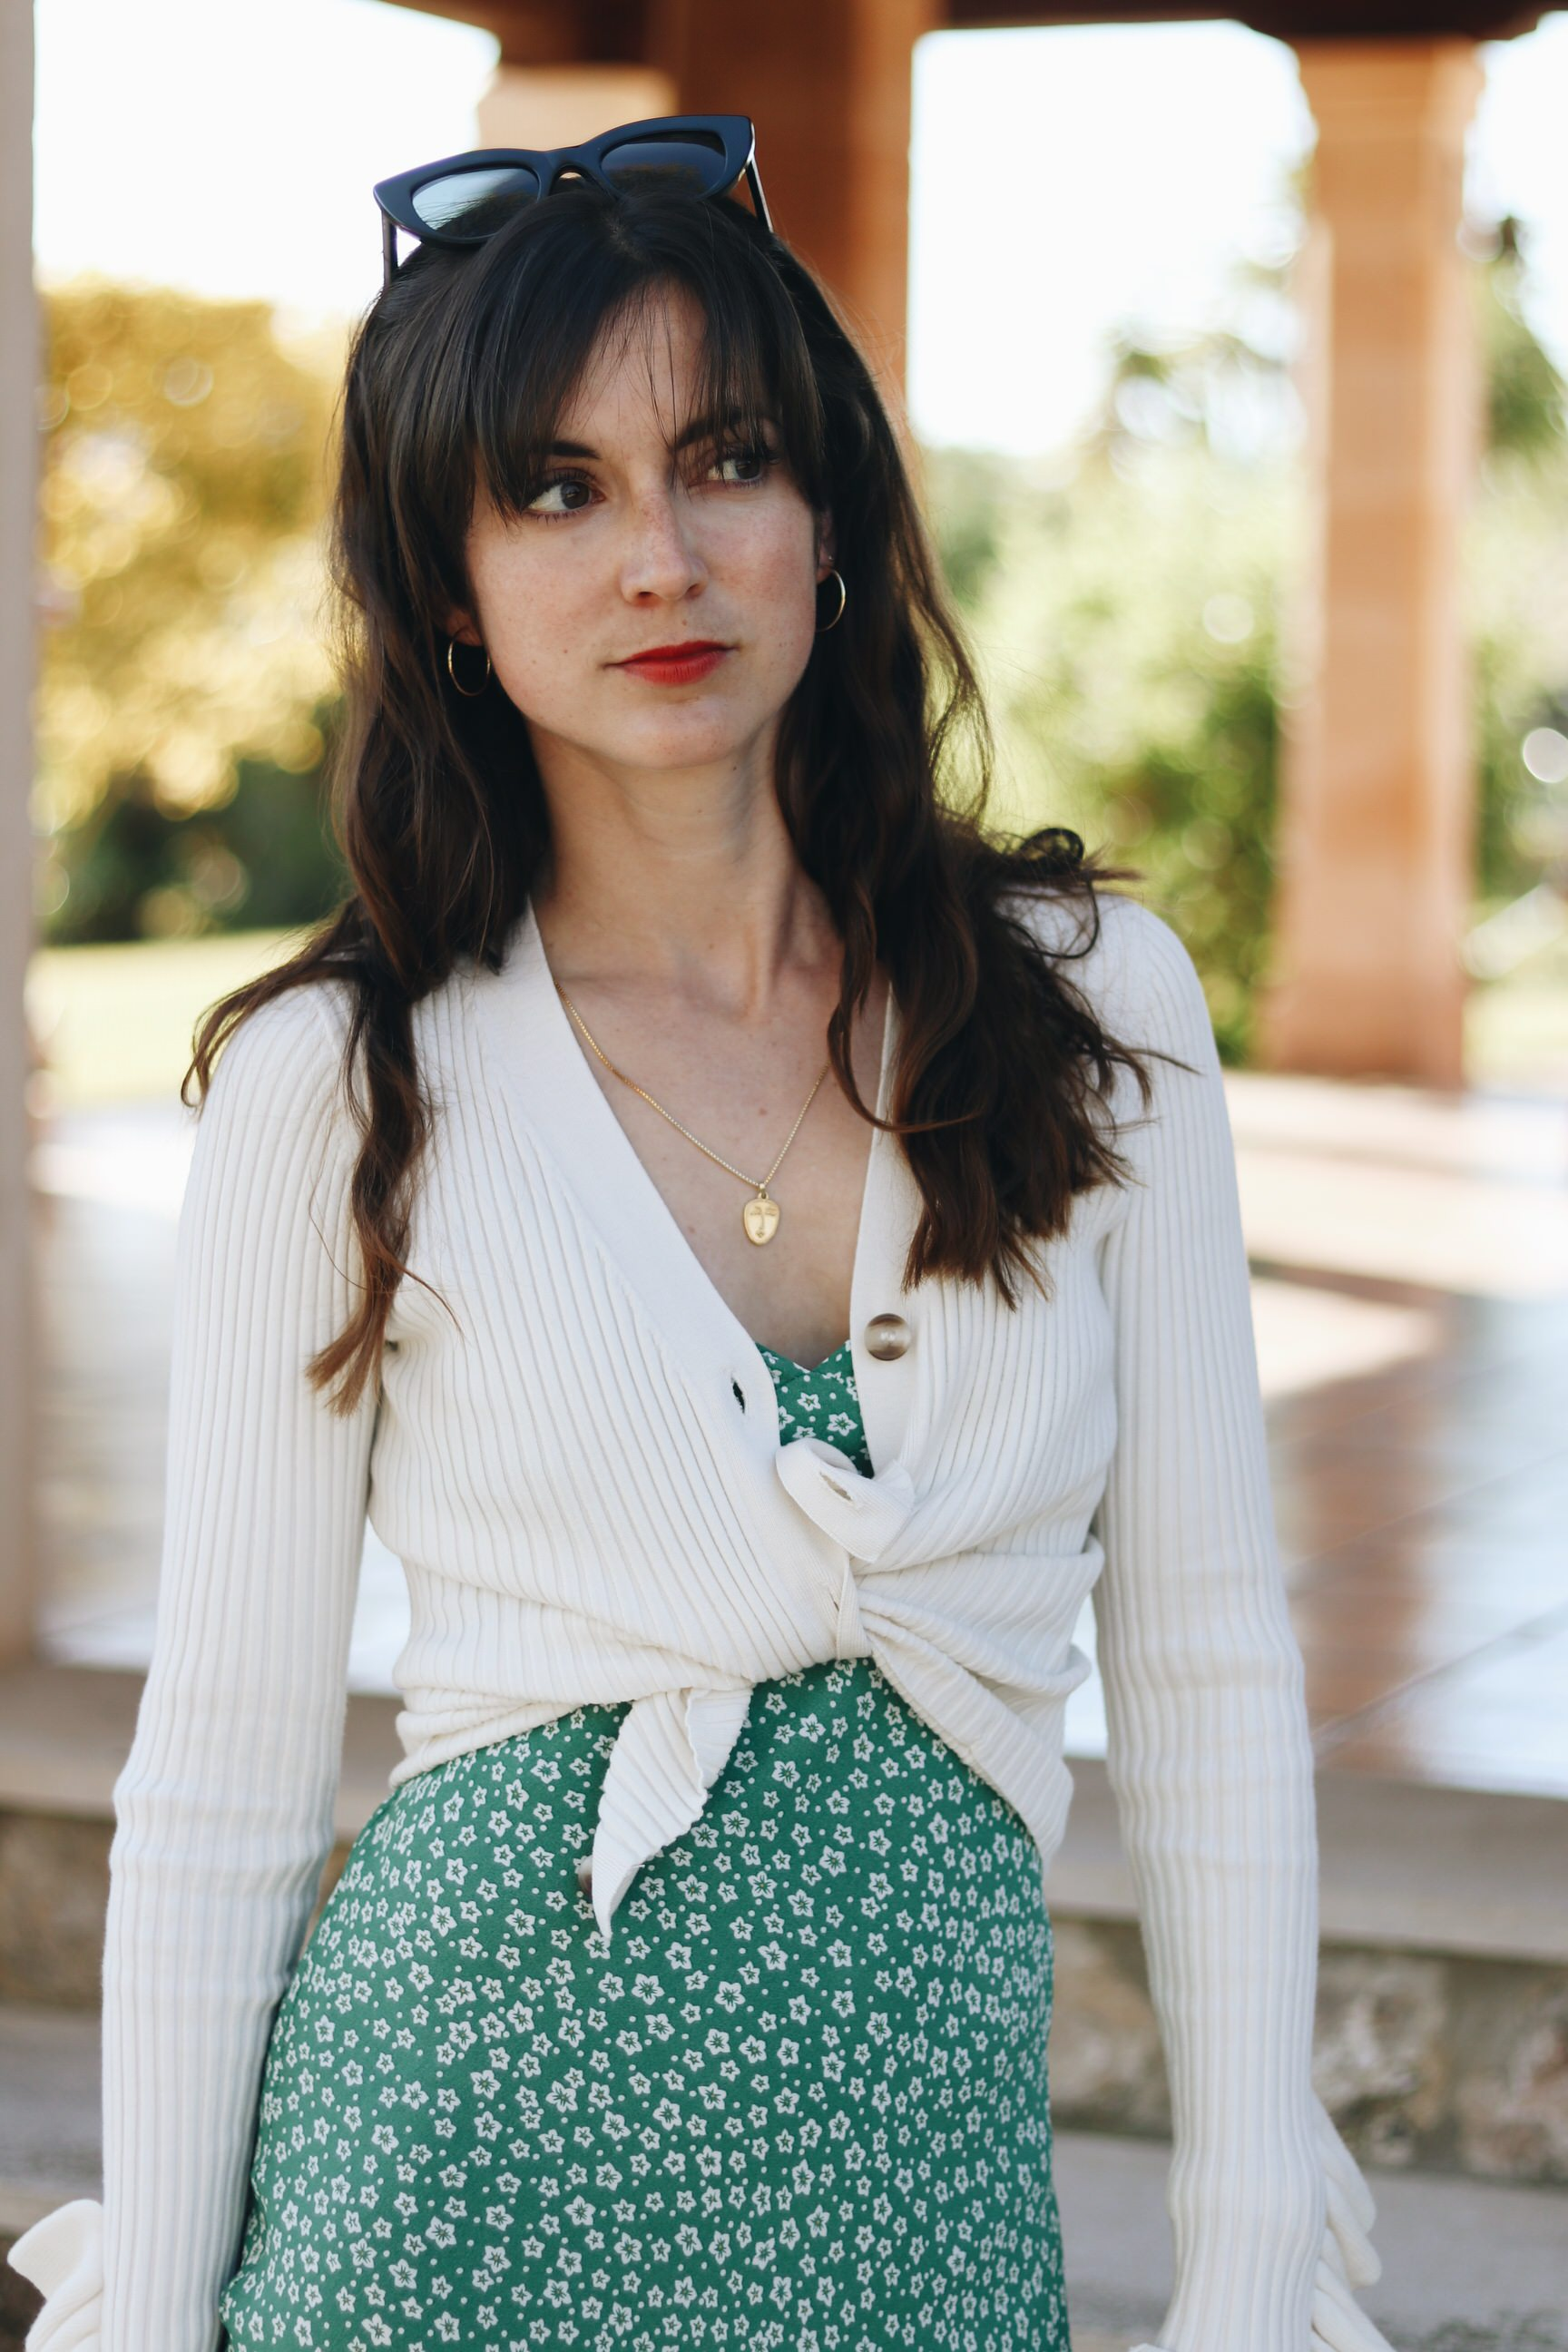 Cardigan weiss kombinieren Blumenmuster Outfit Modebloggerin Neele Freiburg